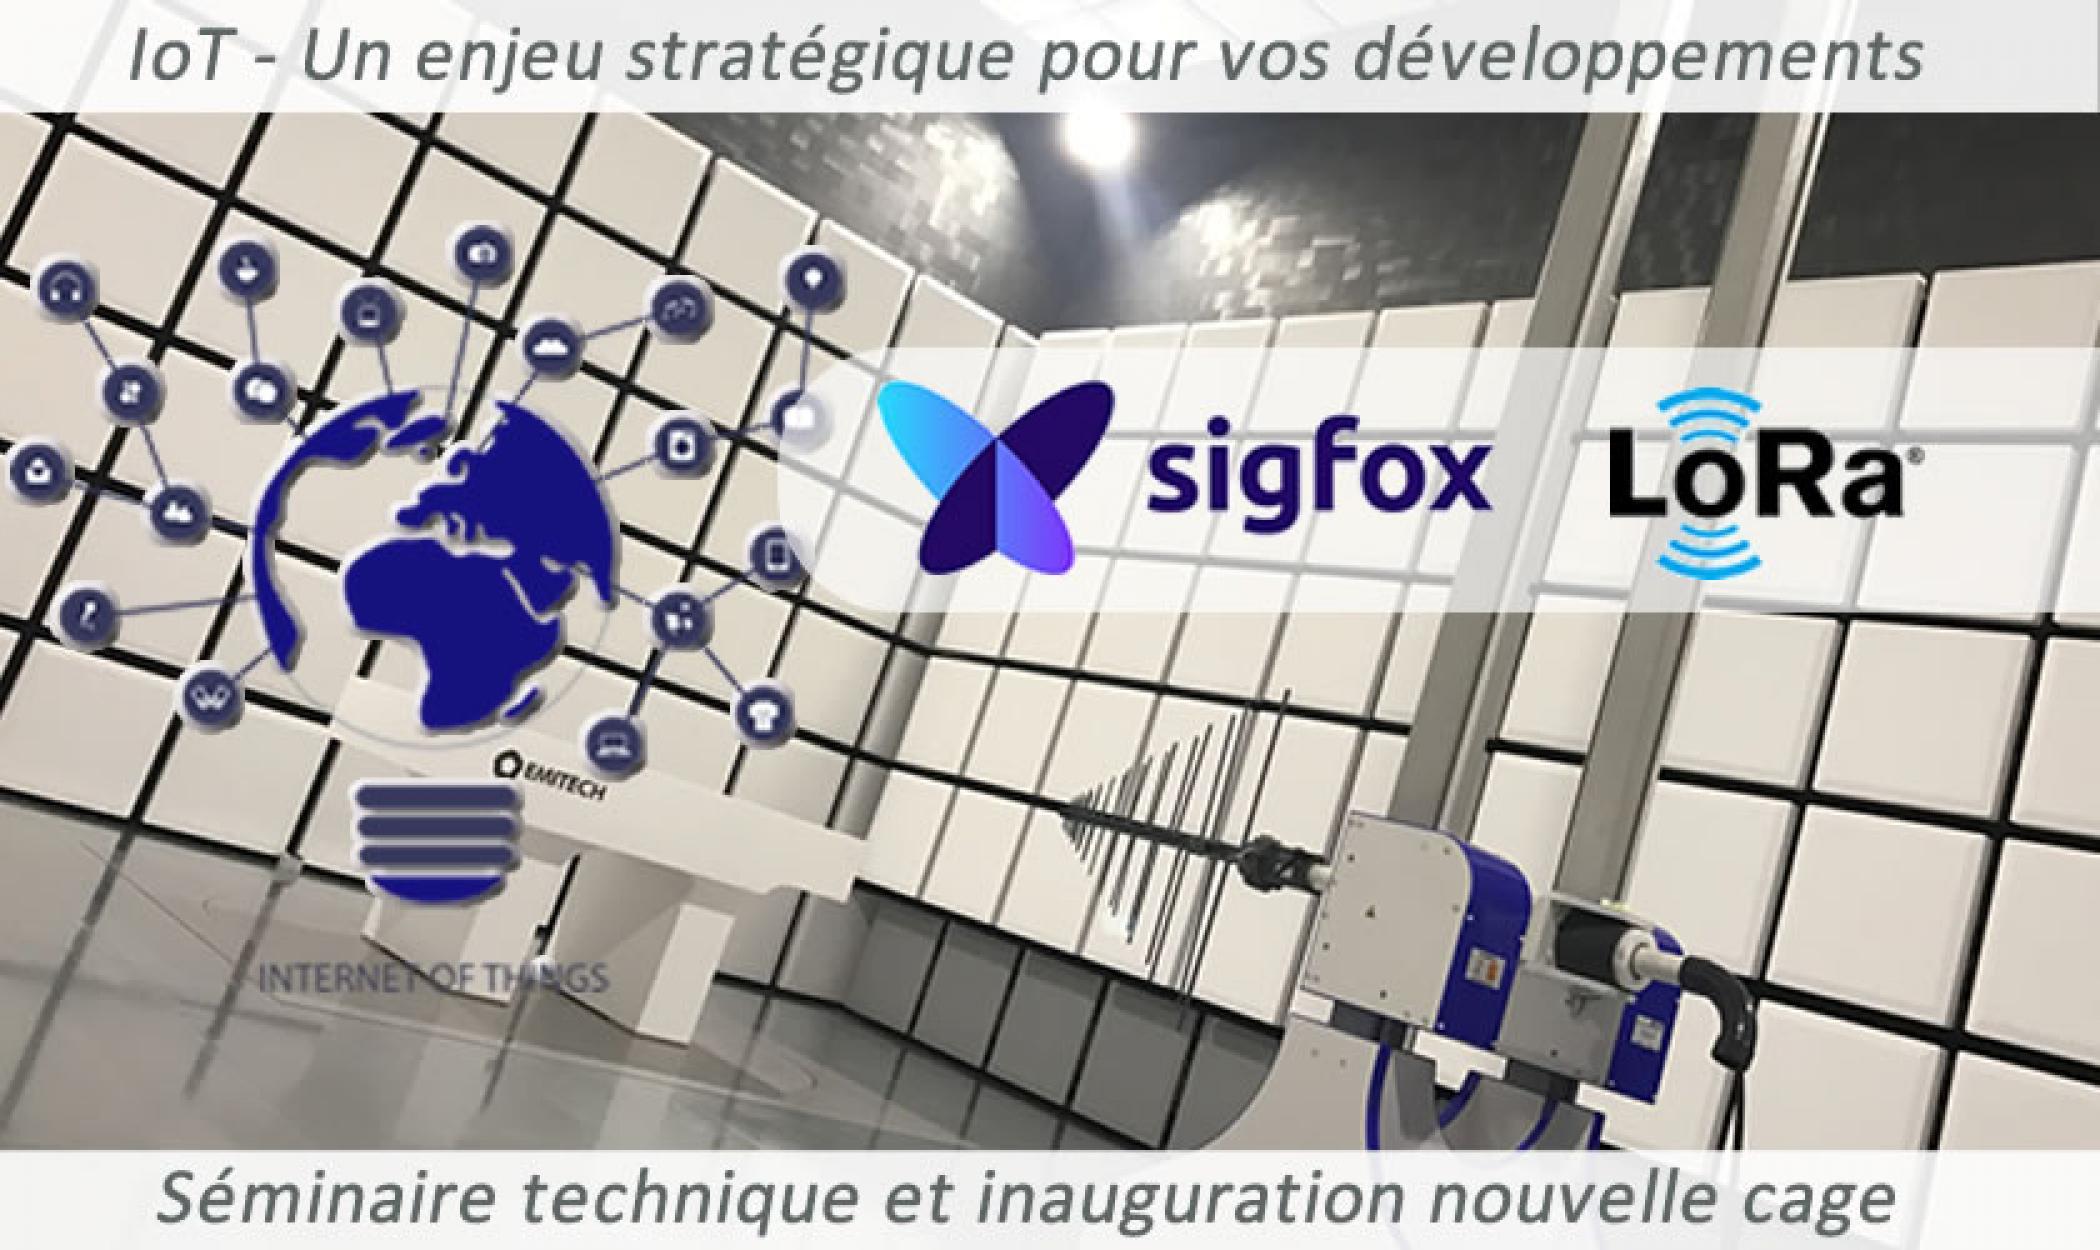 Sigfox, Lora, Internet of Things